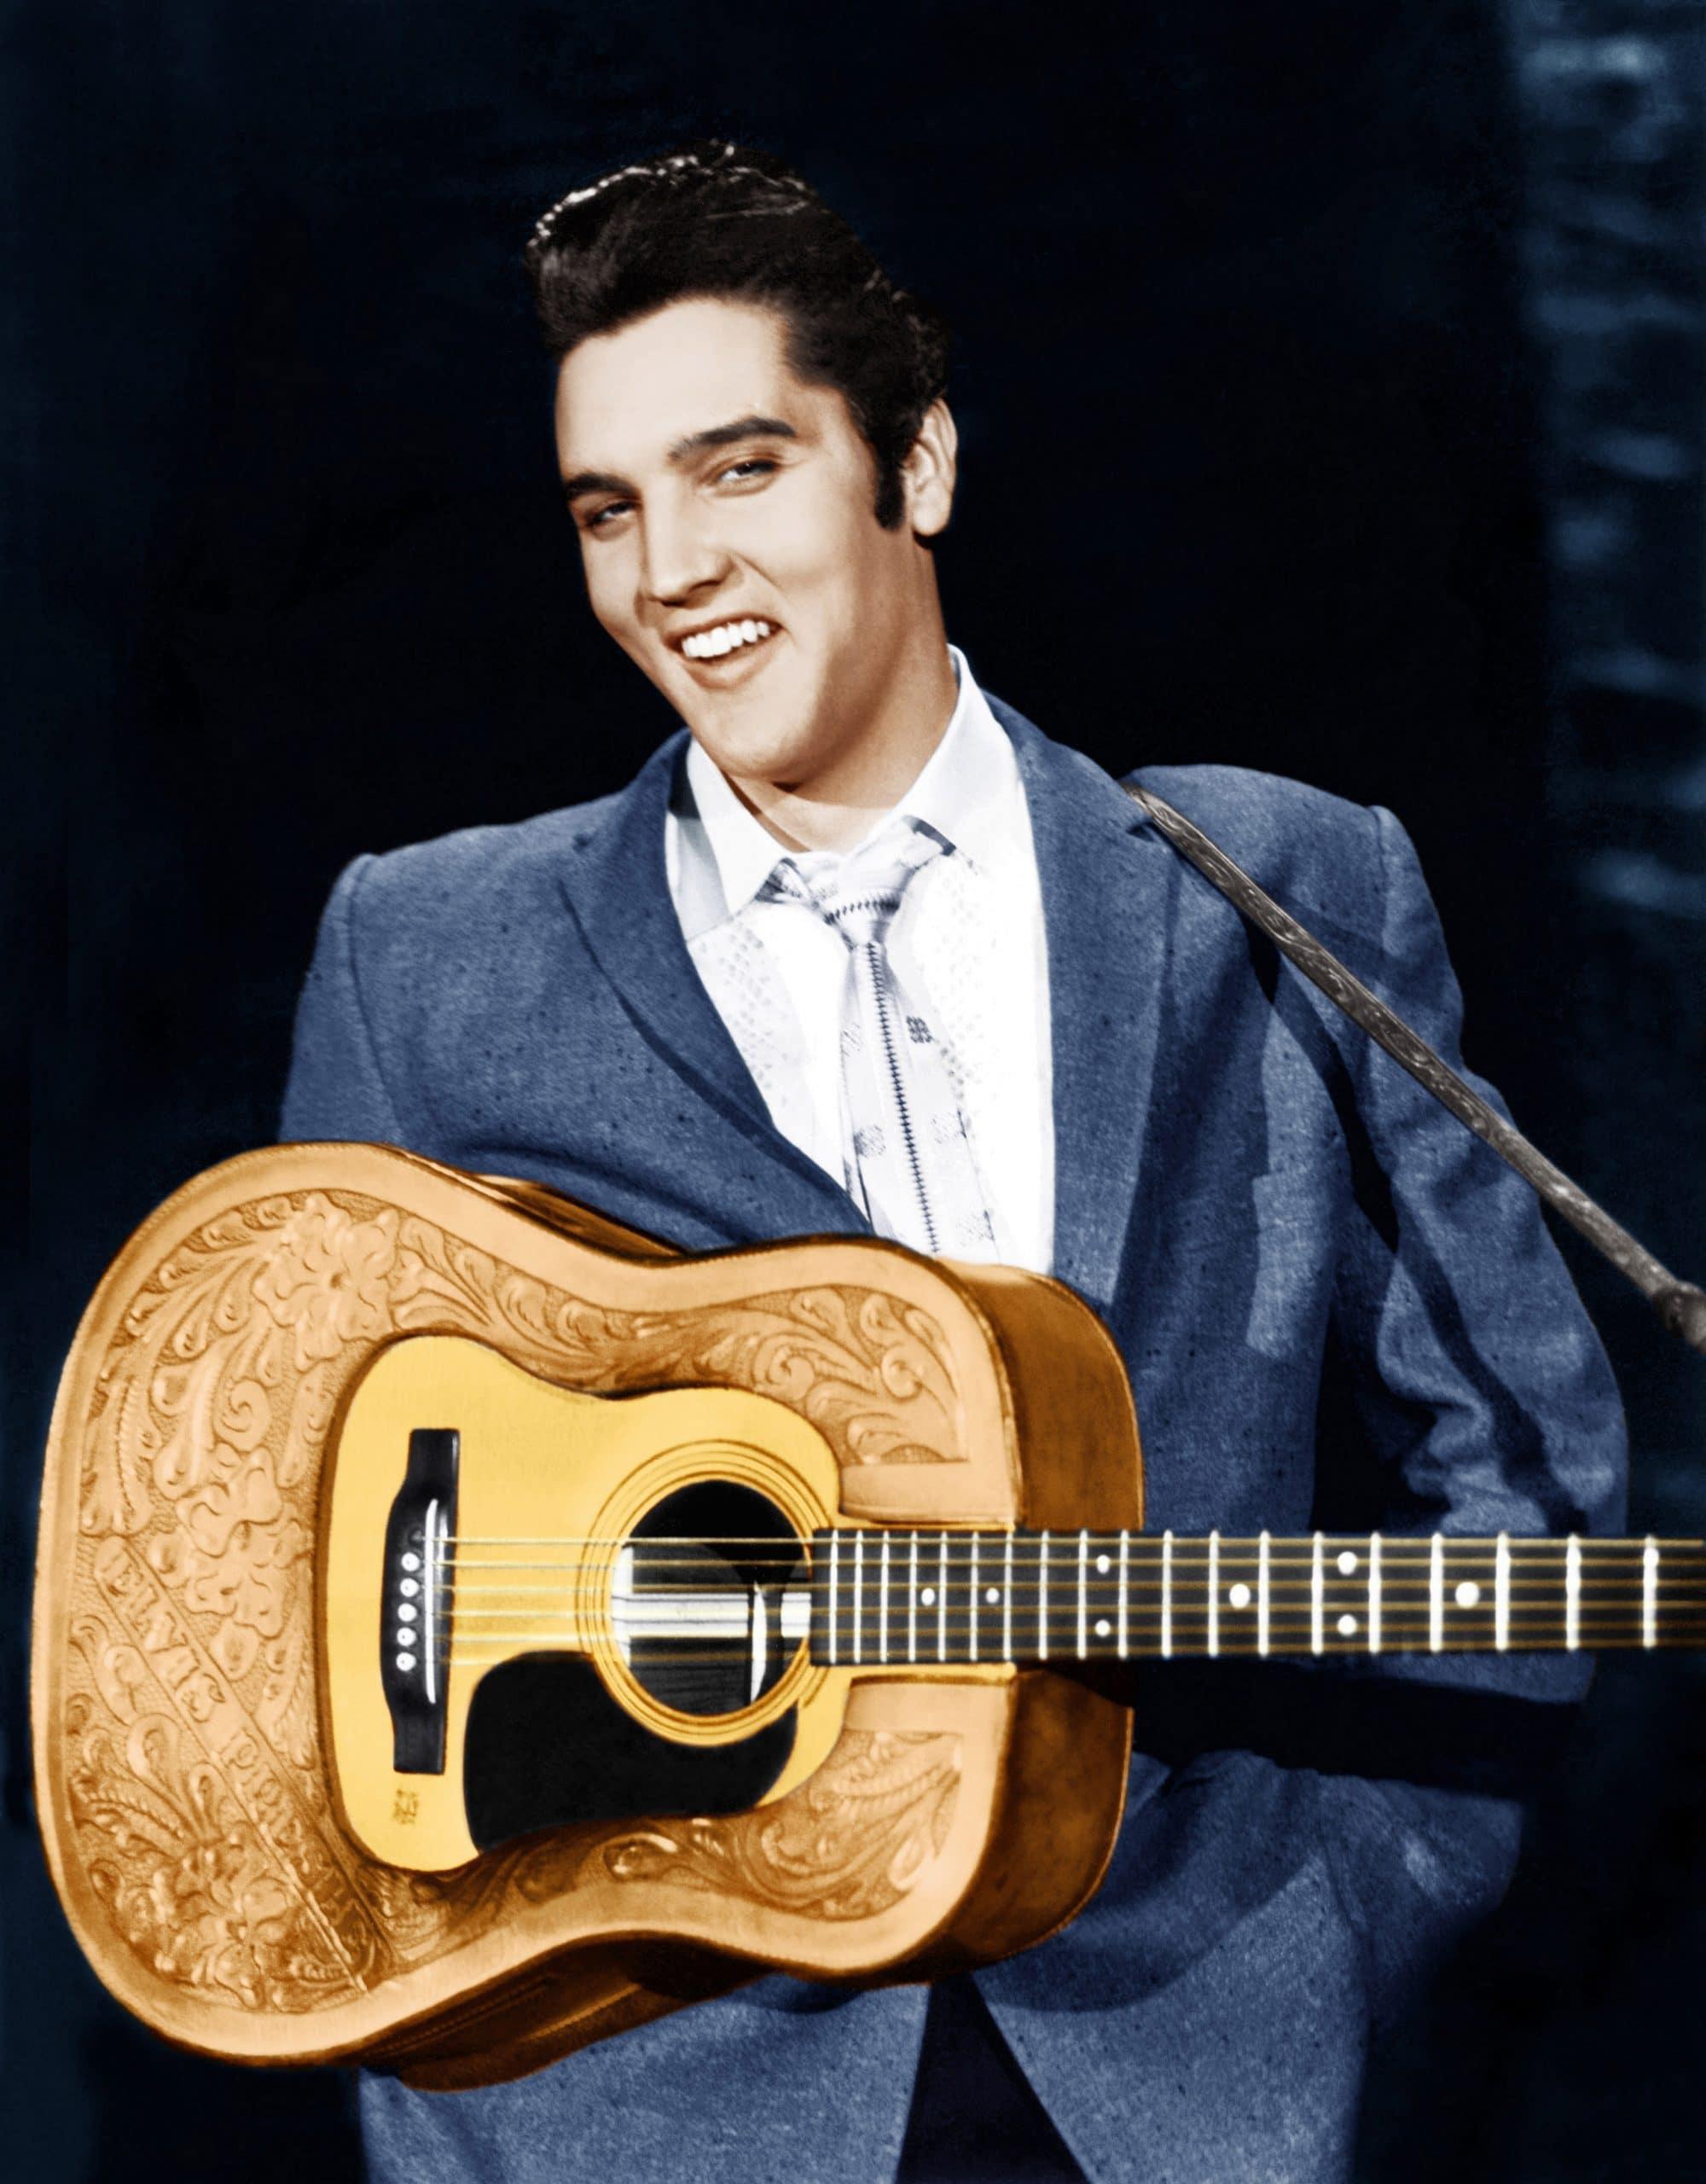 THE ED SULLIVAN SHOW, Elvis Presley